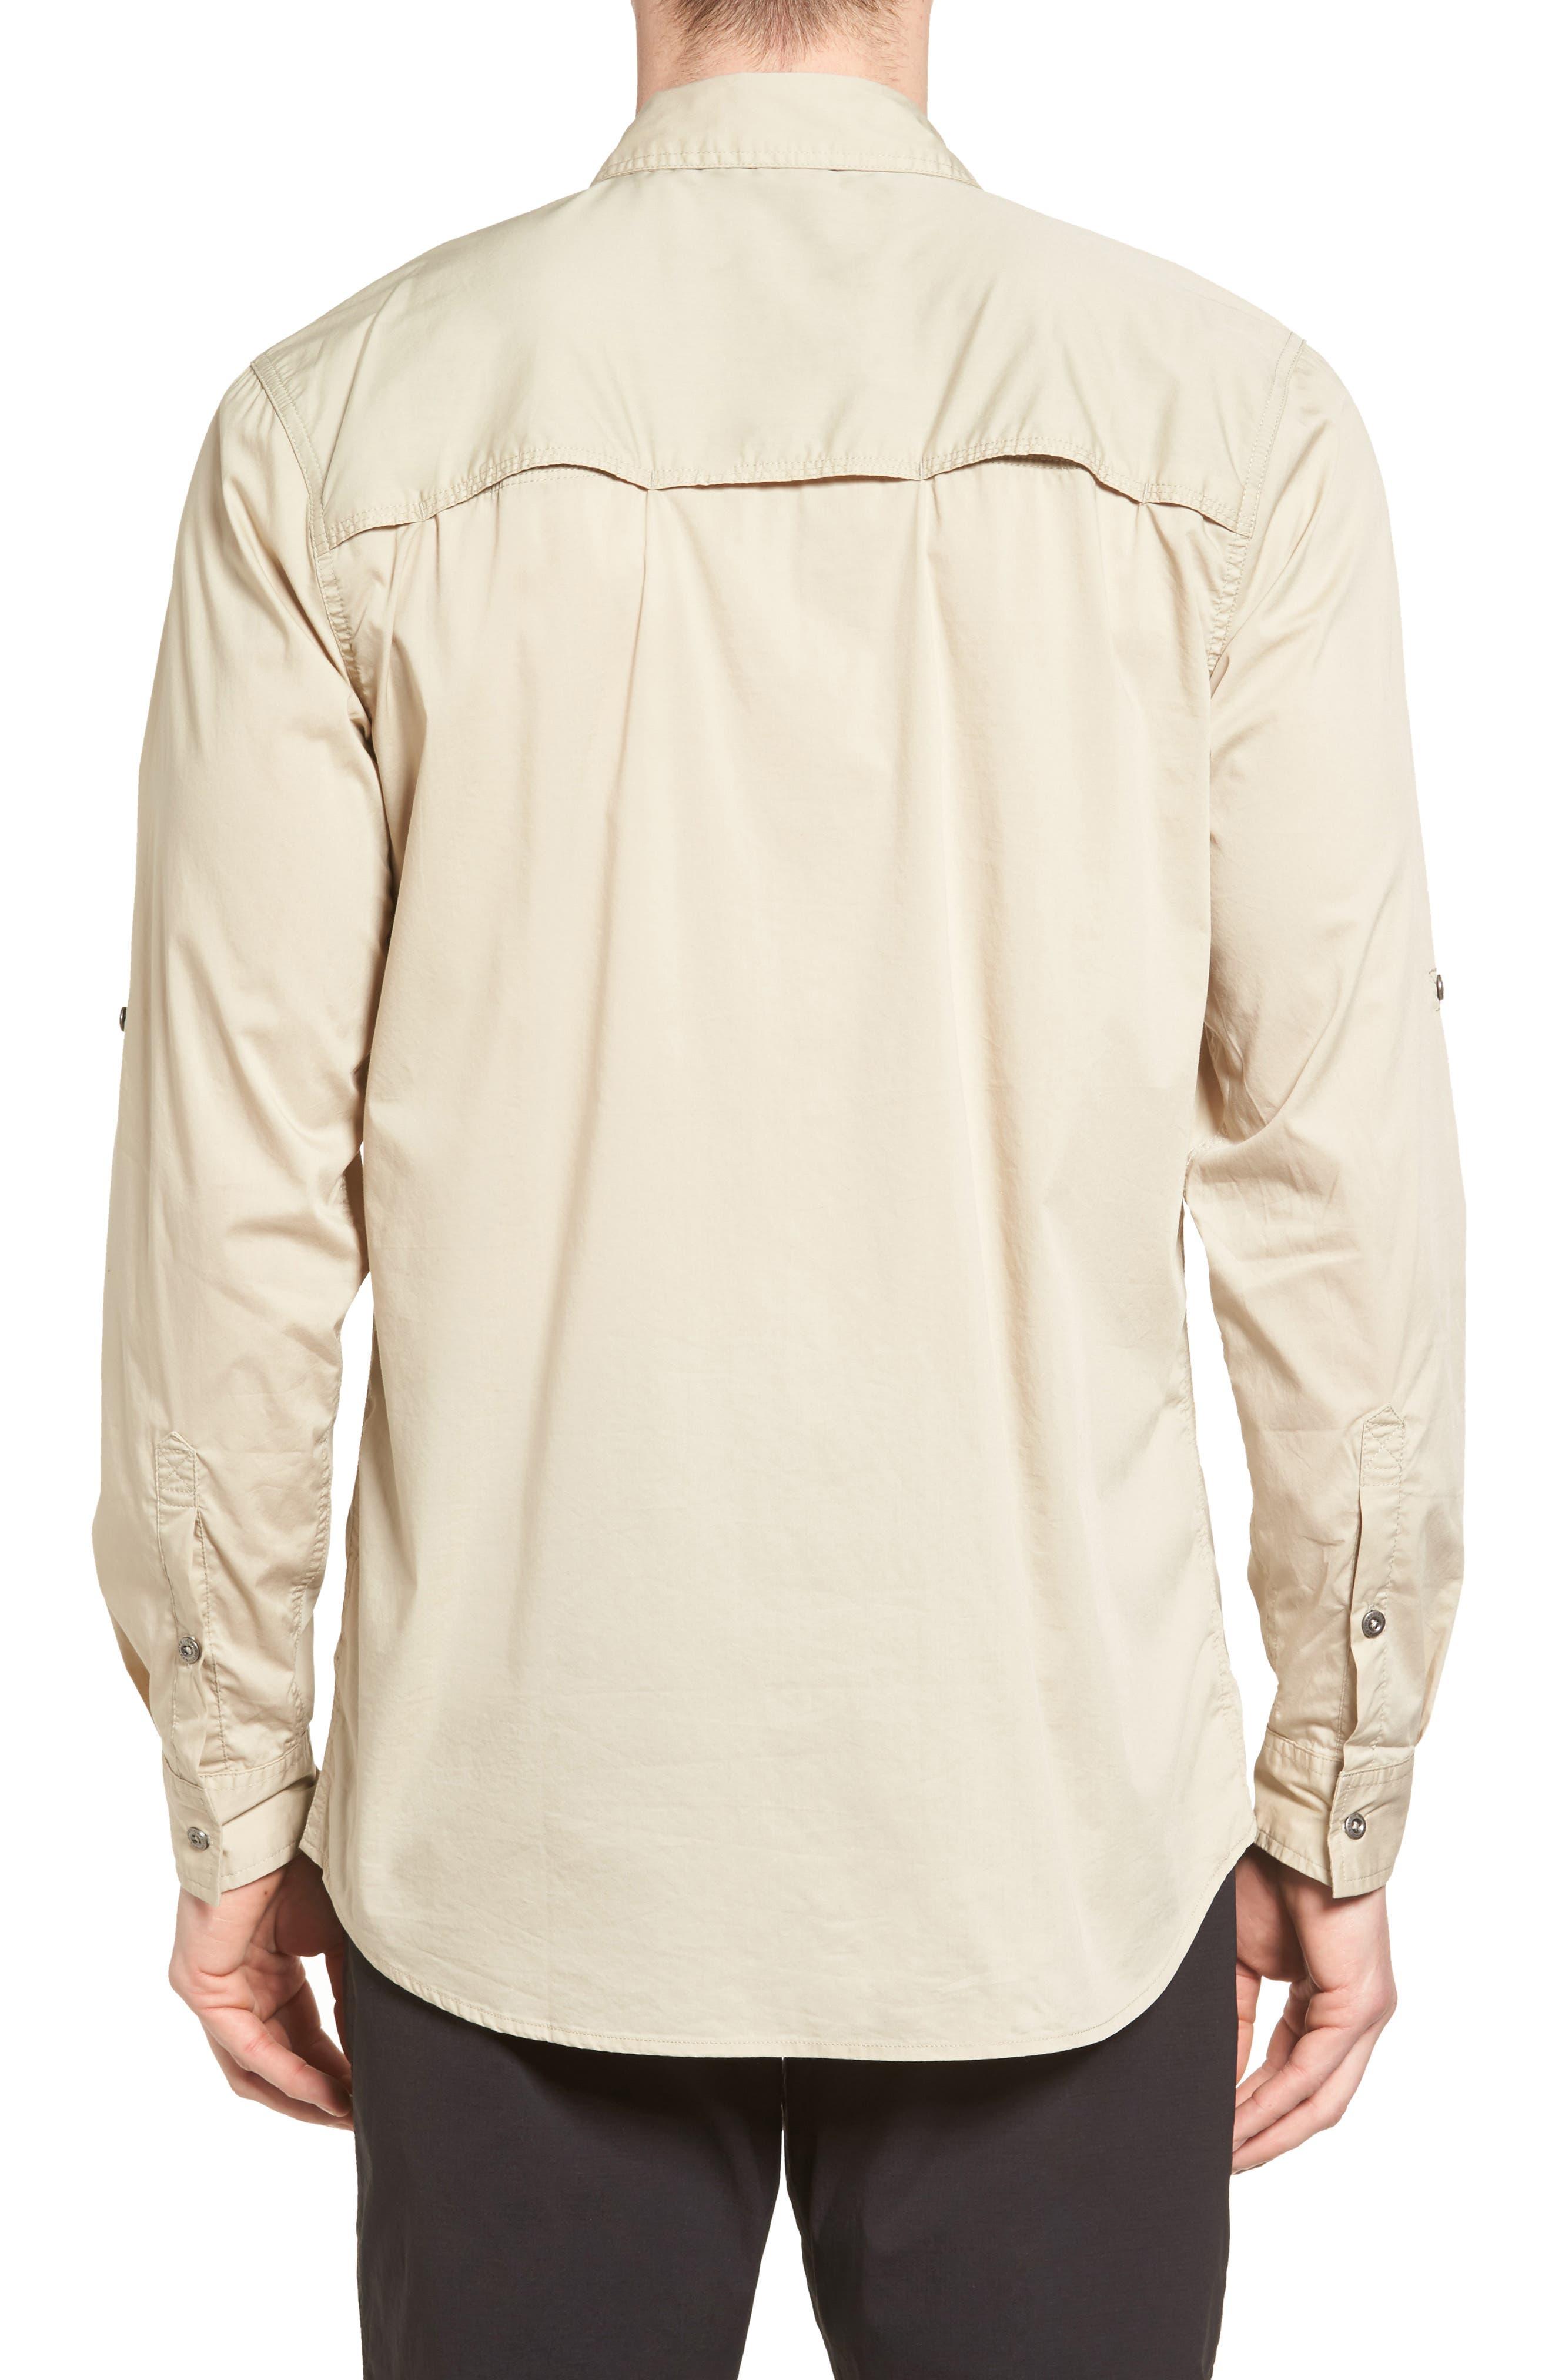 NO-Squito Regular Fit Travel Shirt,                             Alternate thumbnail 2, color,                             True Khaki